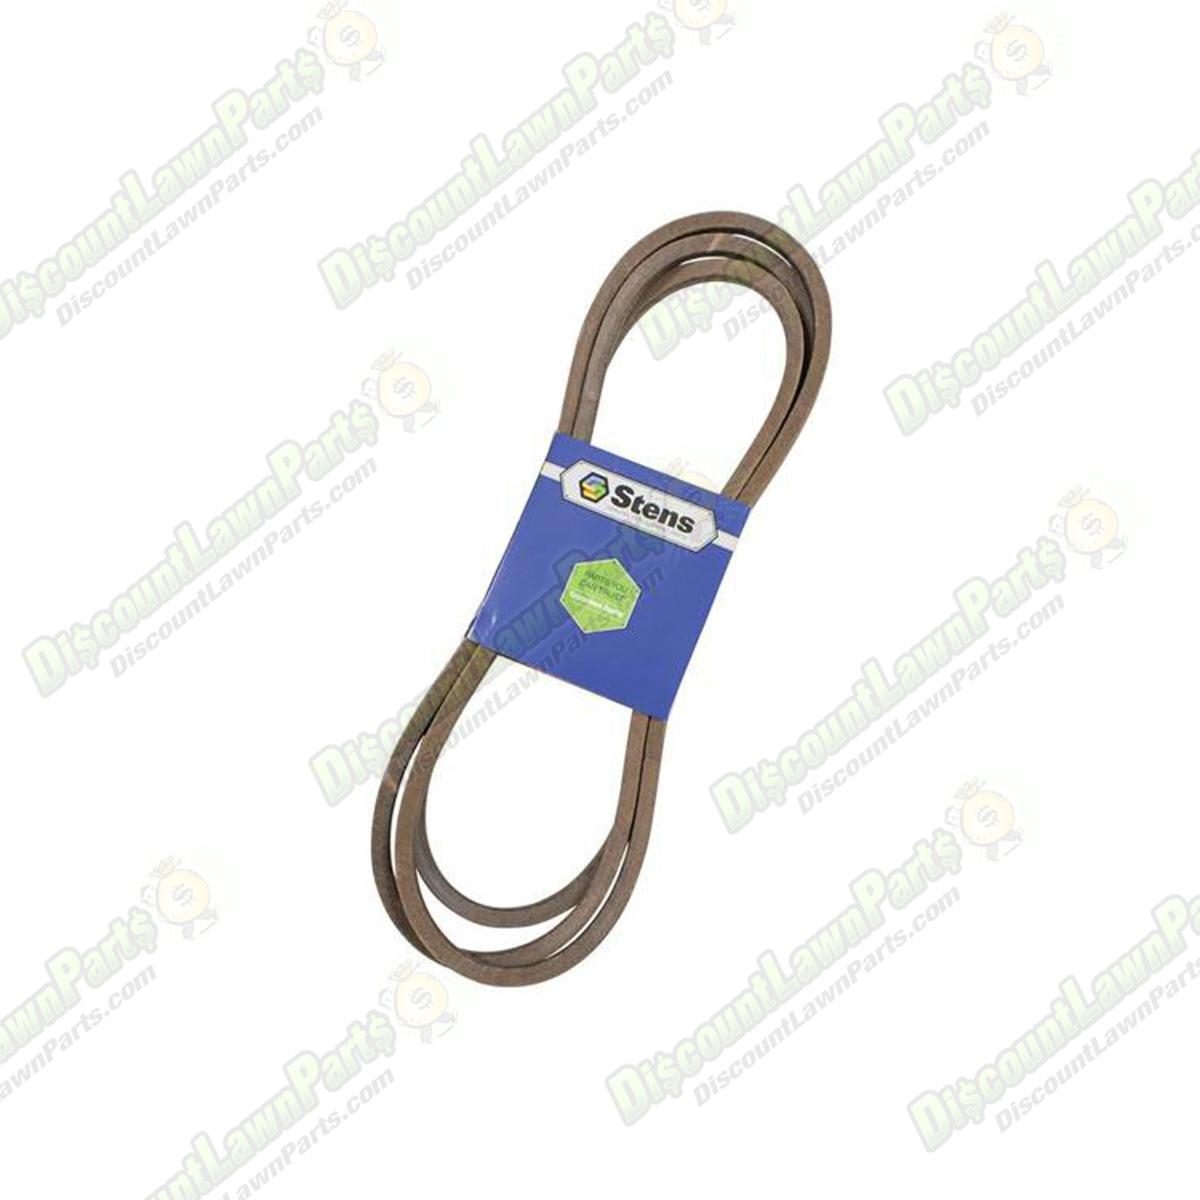 Deck  Belt Applicati OEM Replacement Belt Wright Mfg 71460067 Belt Application